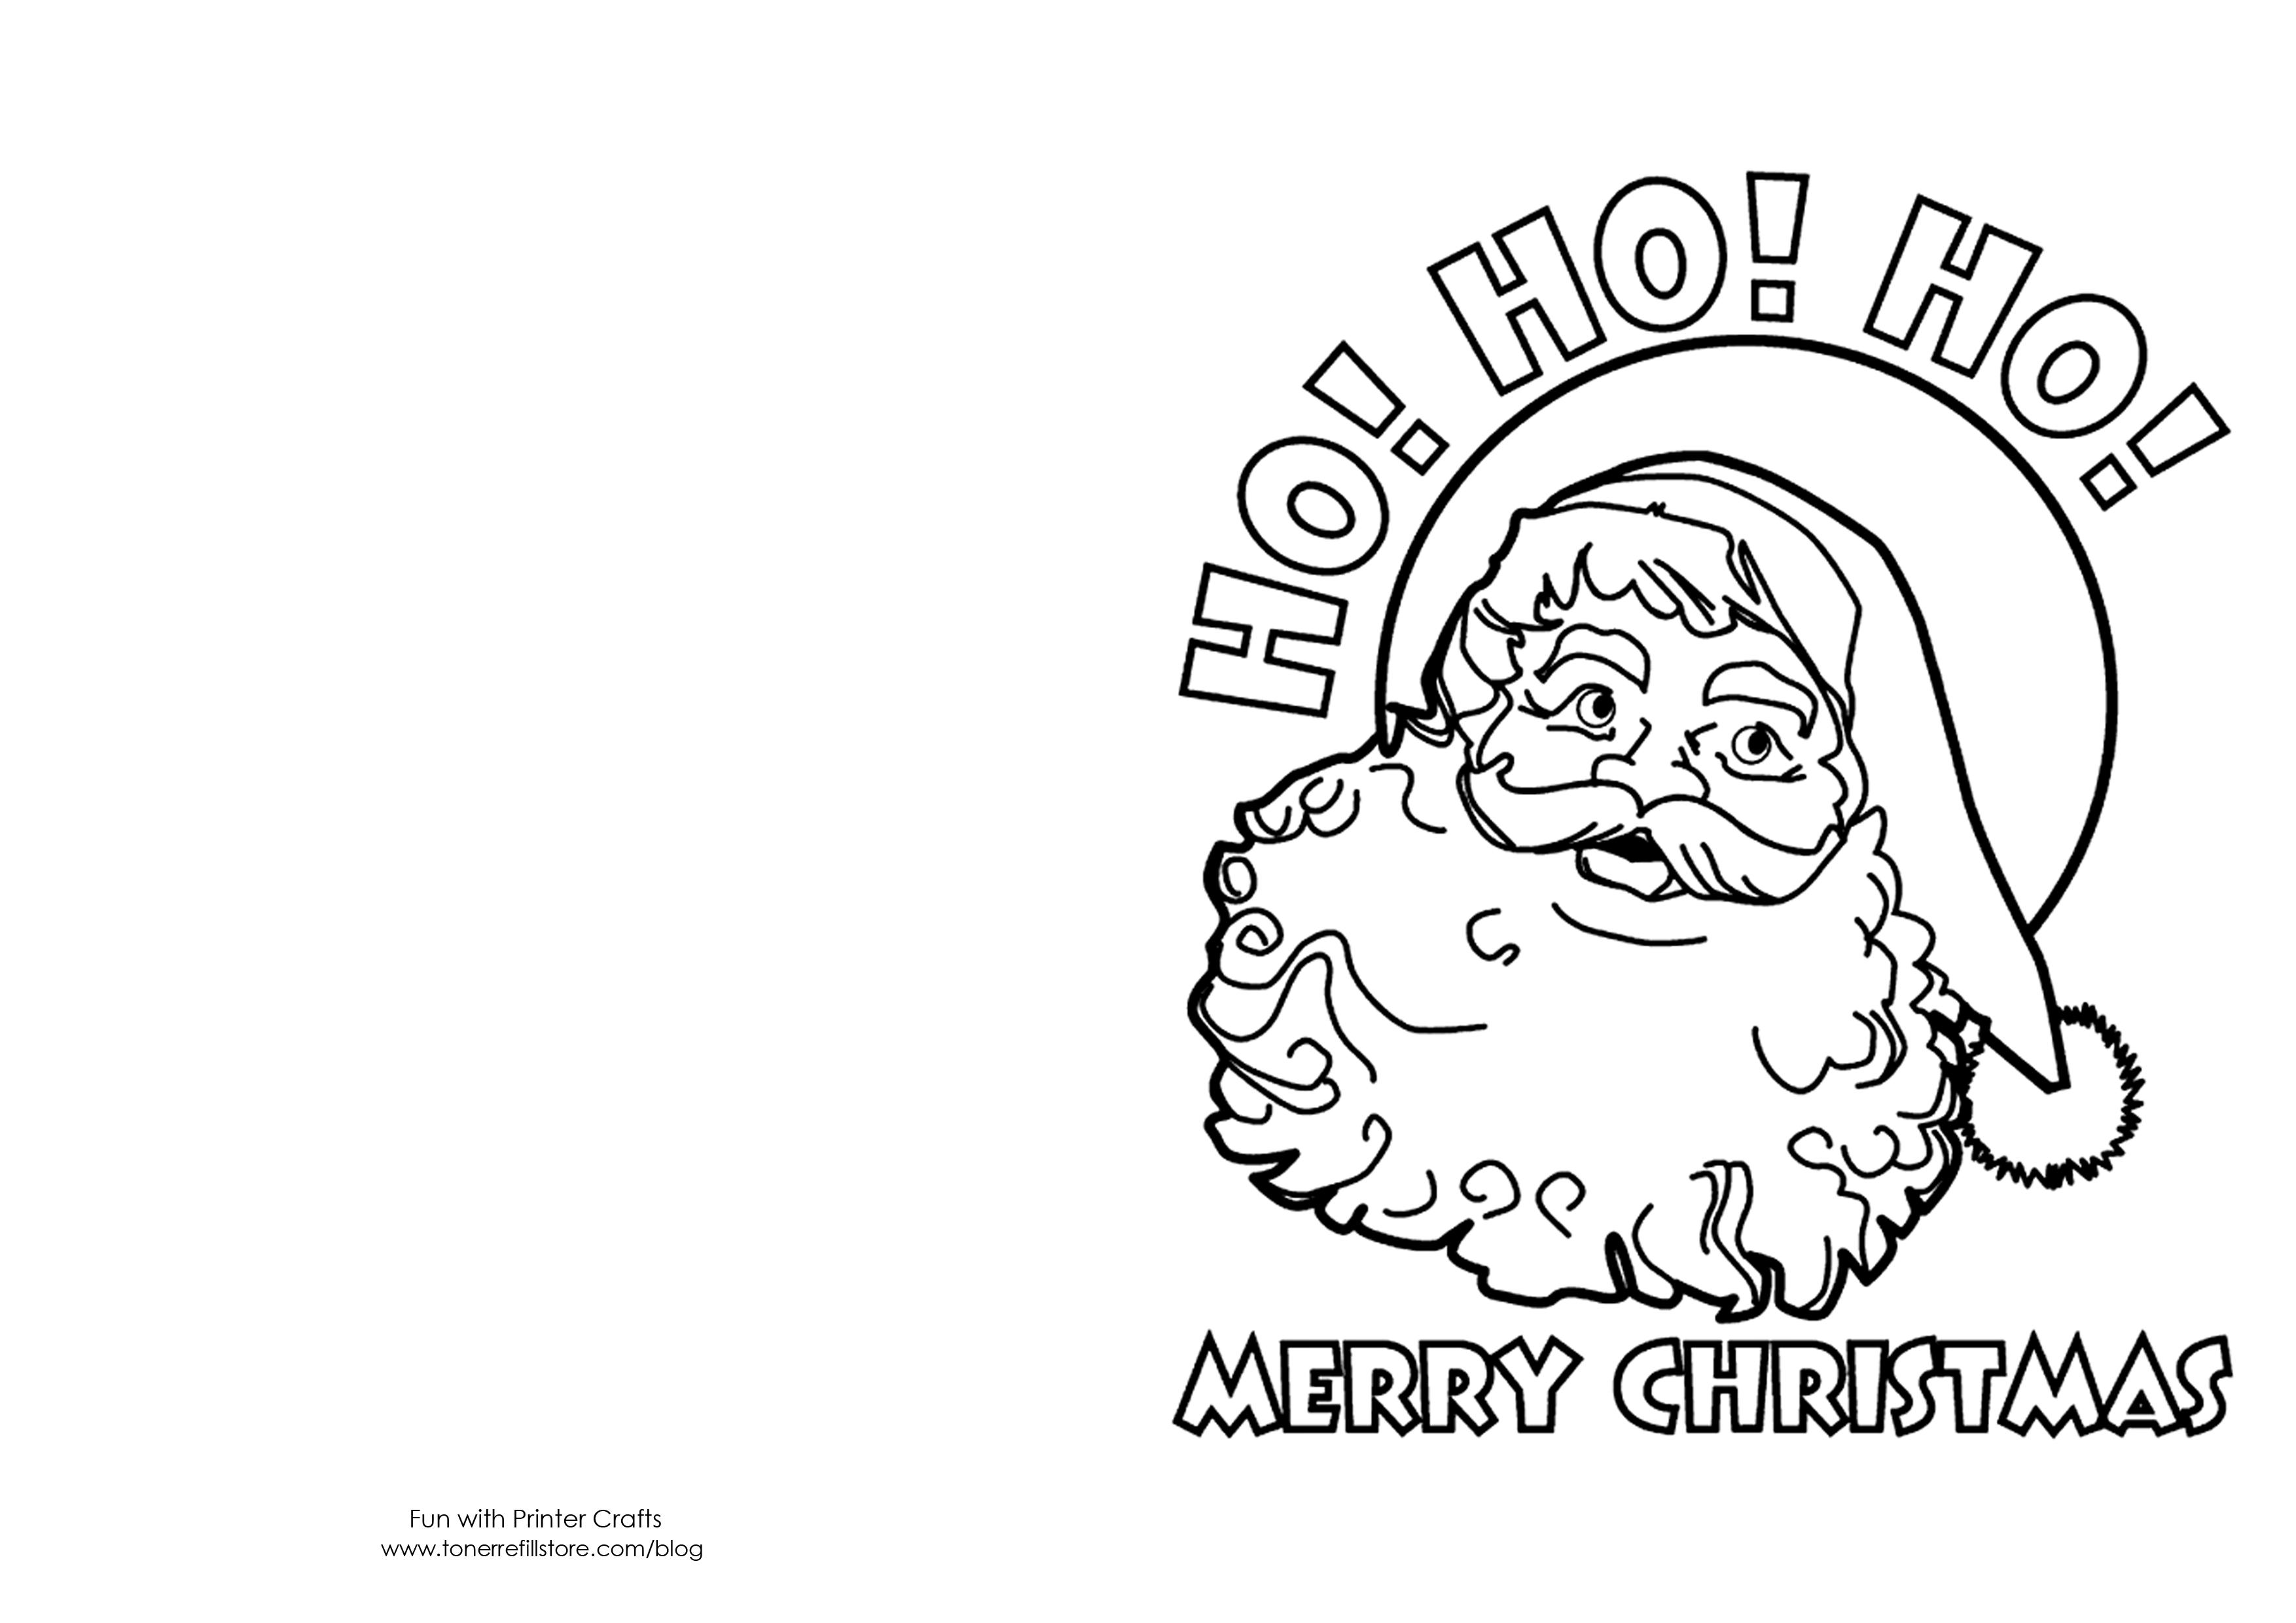 Printable Christmas Card Templates To Color Wedding Invitations Coloring Home